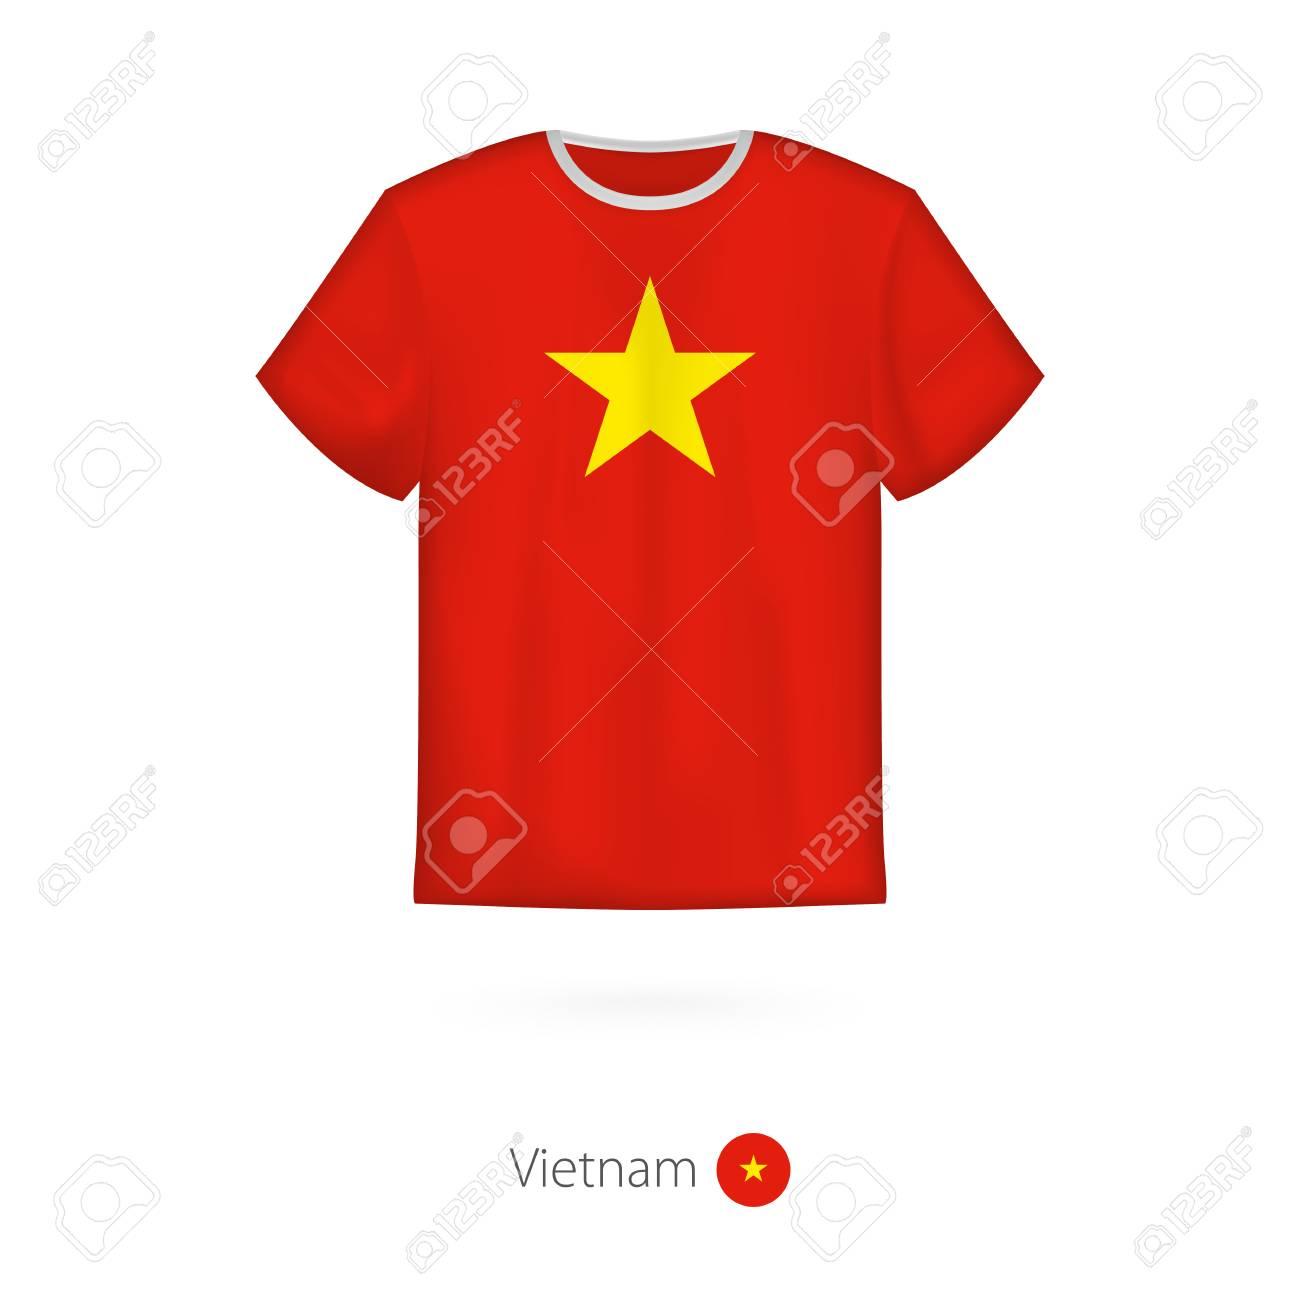 T Shirt Design With Flag Of Vietnam T Shirt Vector Template